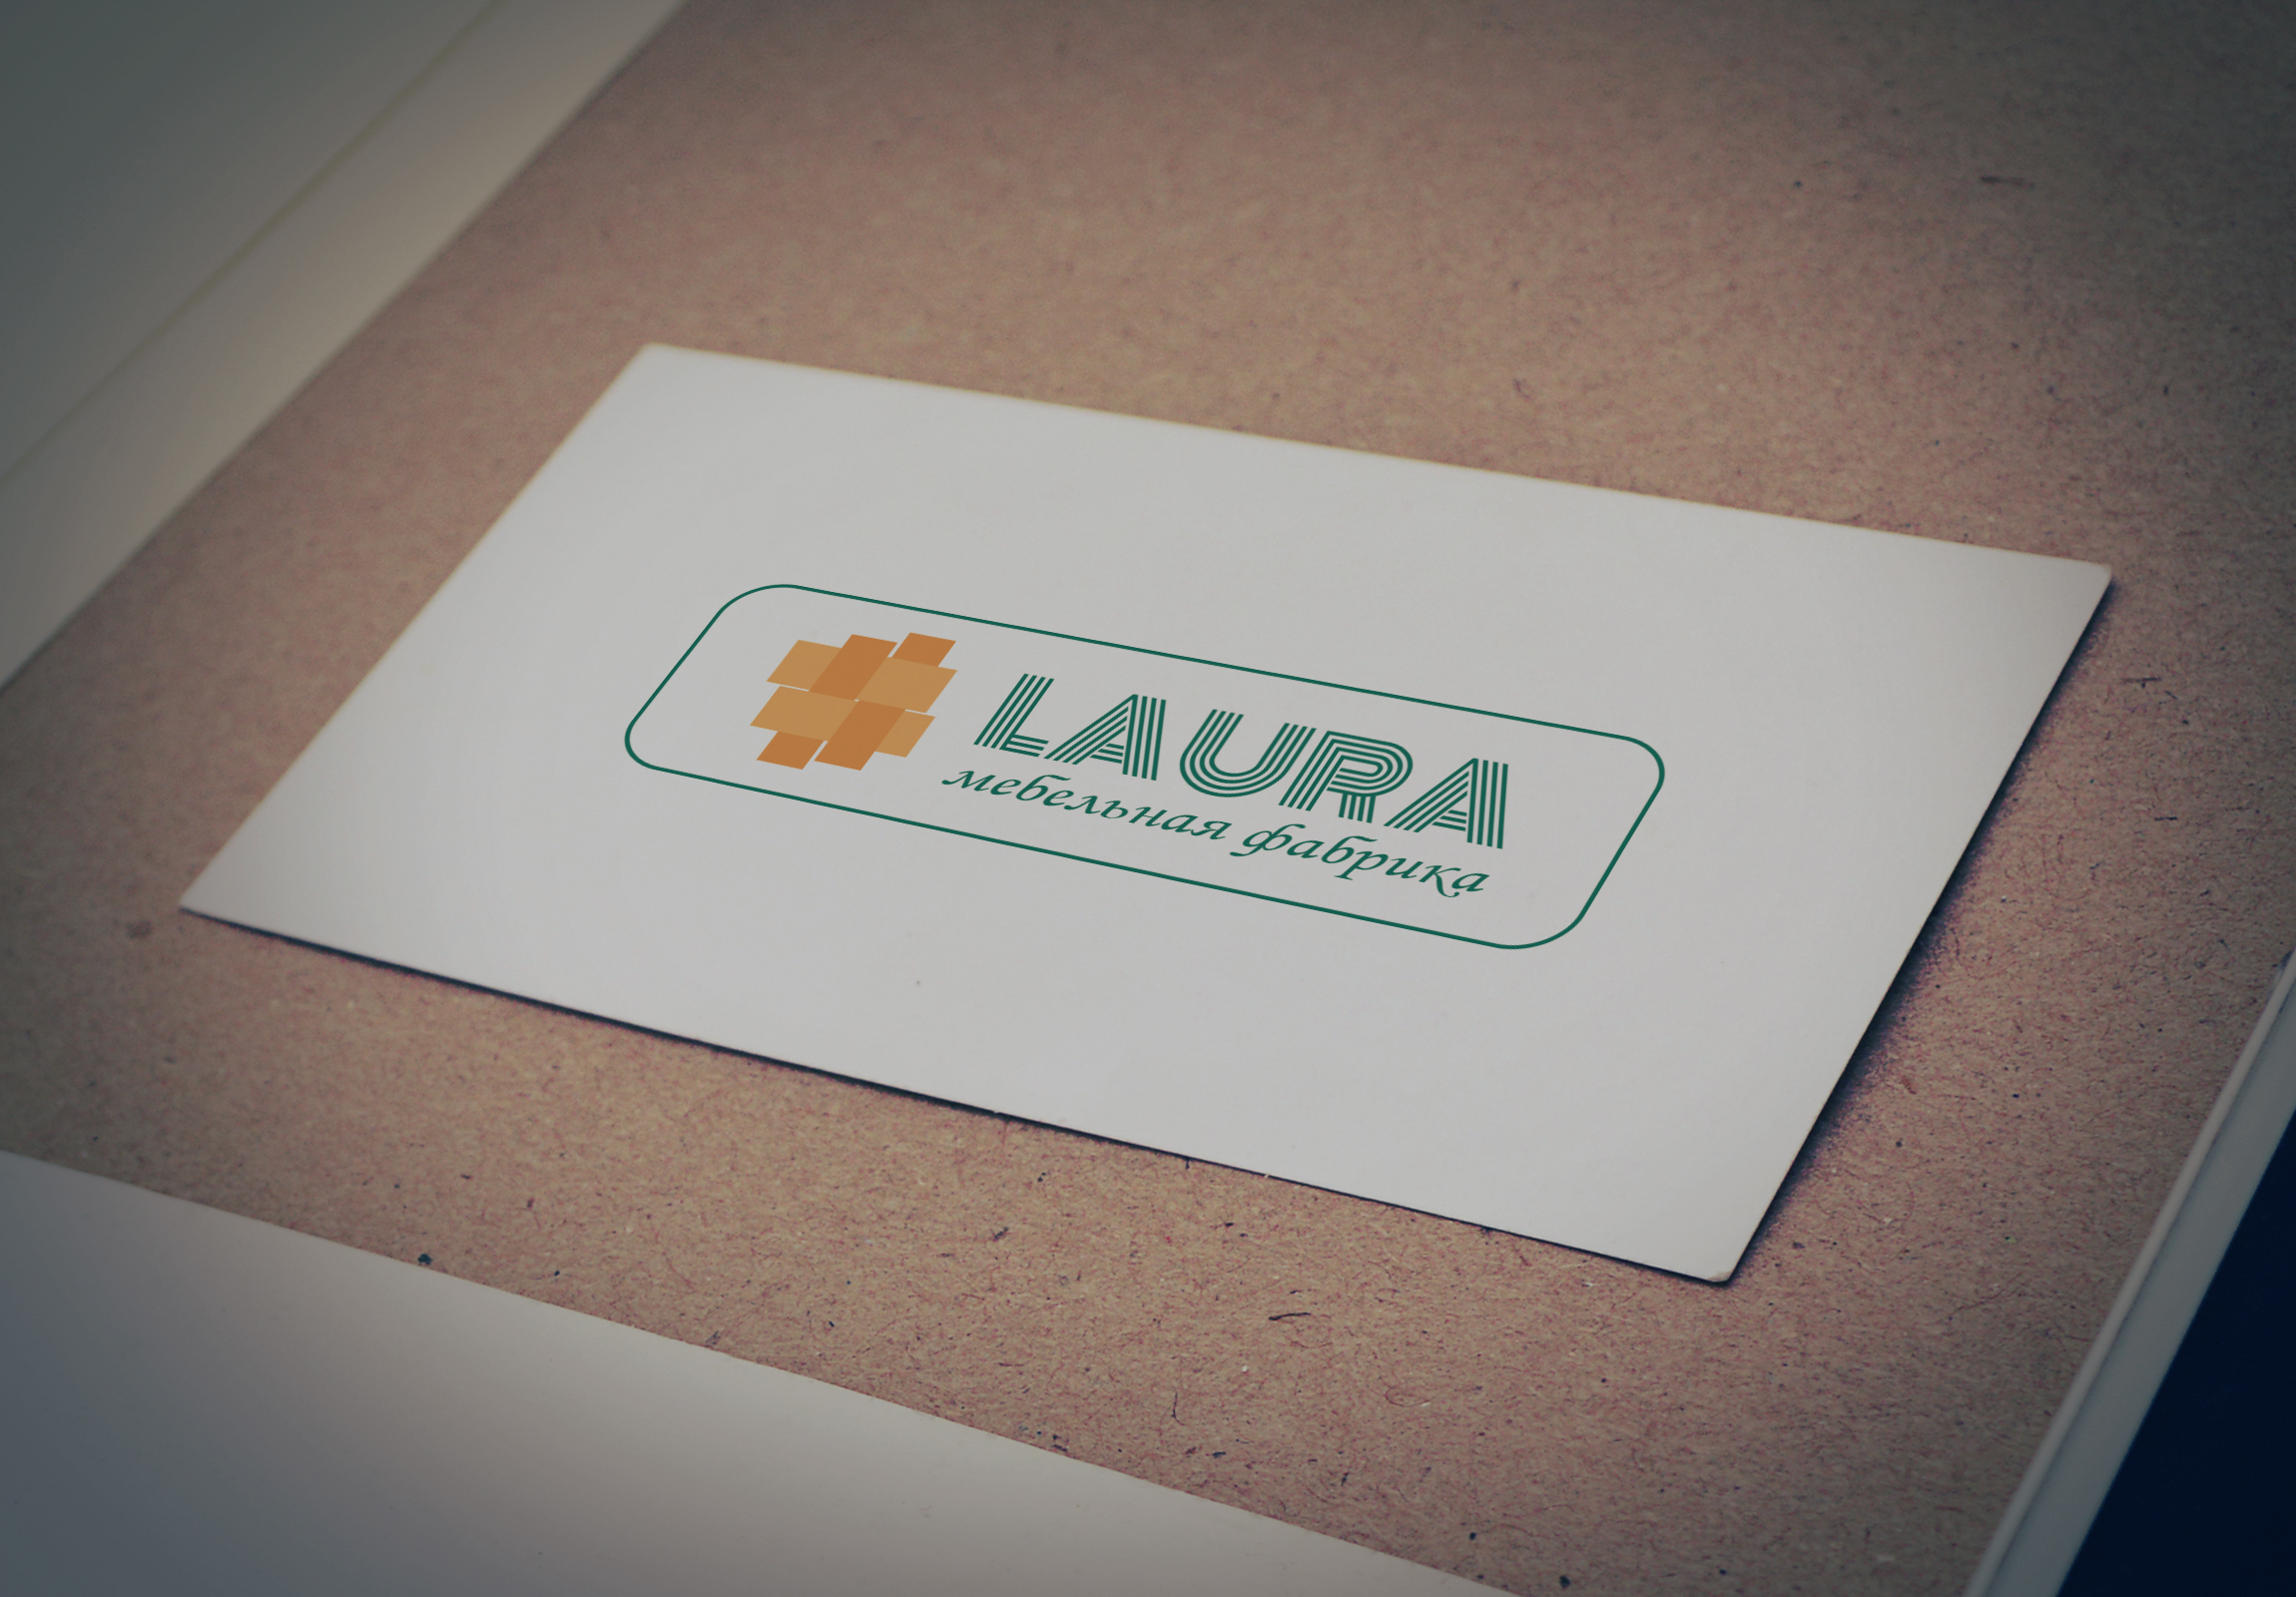 Разработать логотип для фабрики мебели фото f_53259b98a29d45a4.jpg